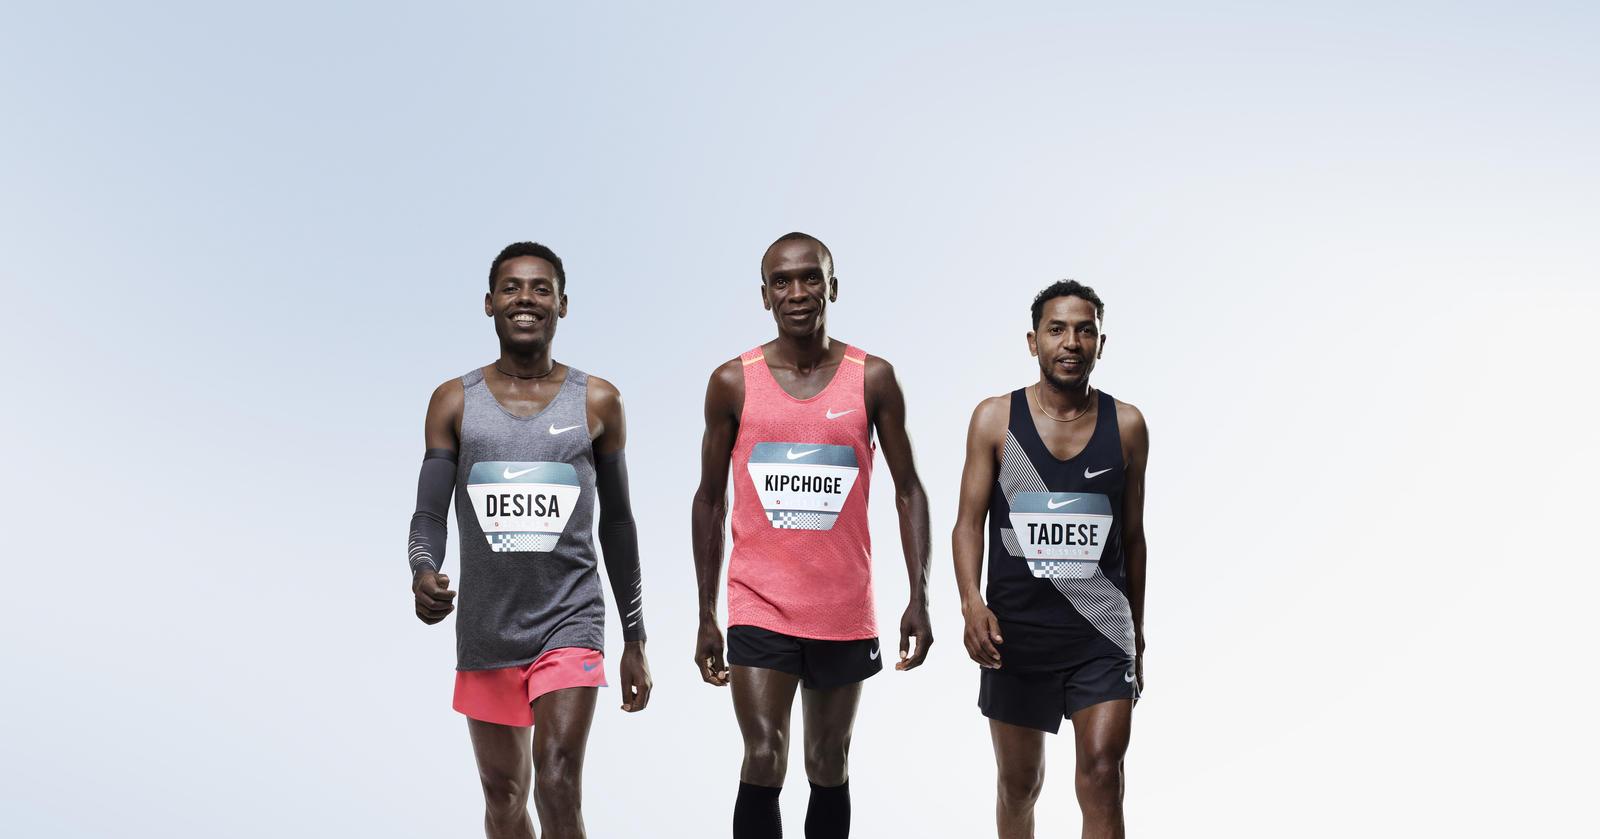 Distracción Asistente preámbulo  Nike's Breaking2 initiative was a crazy physical achievement and a  brilliant marketing campaign | TechCrunch